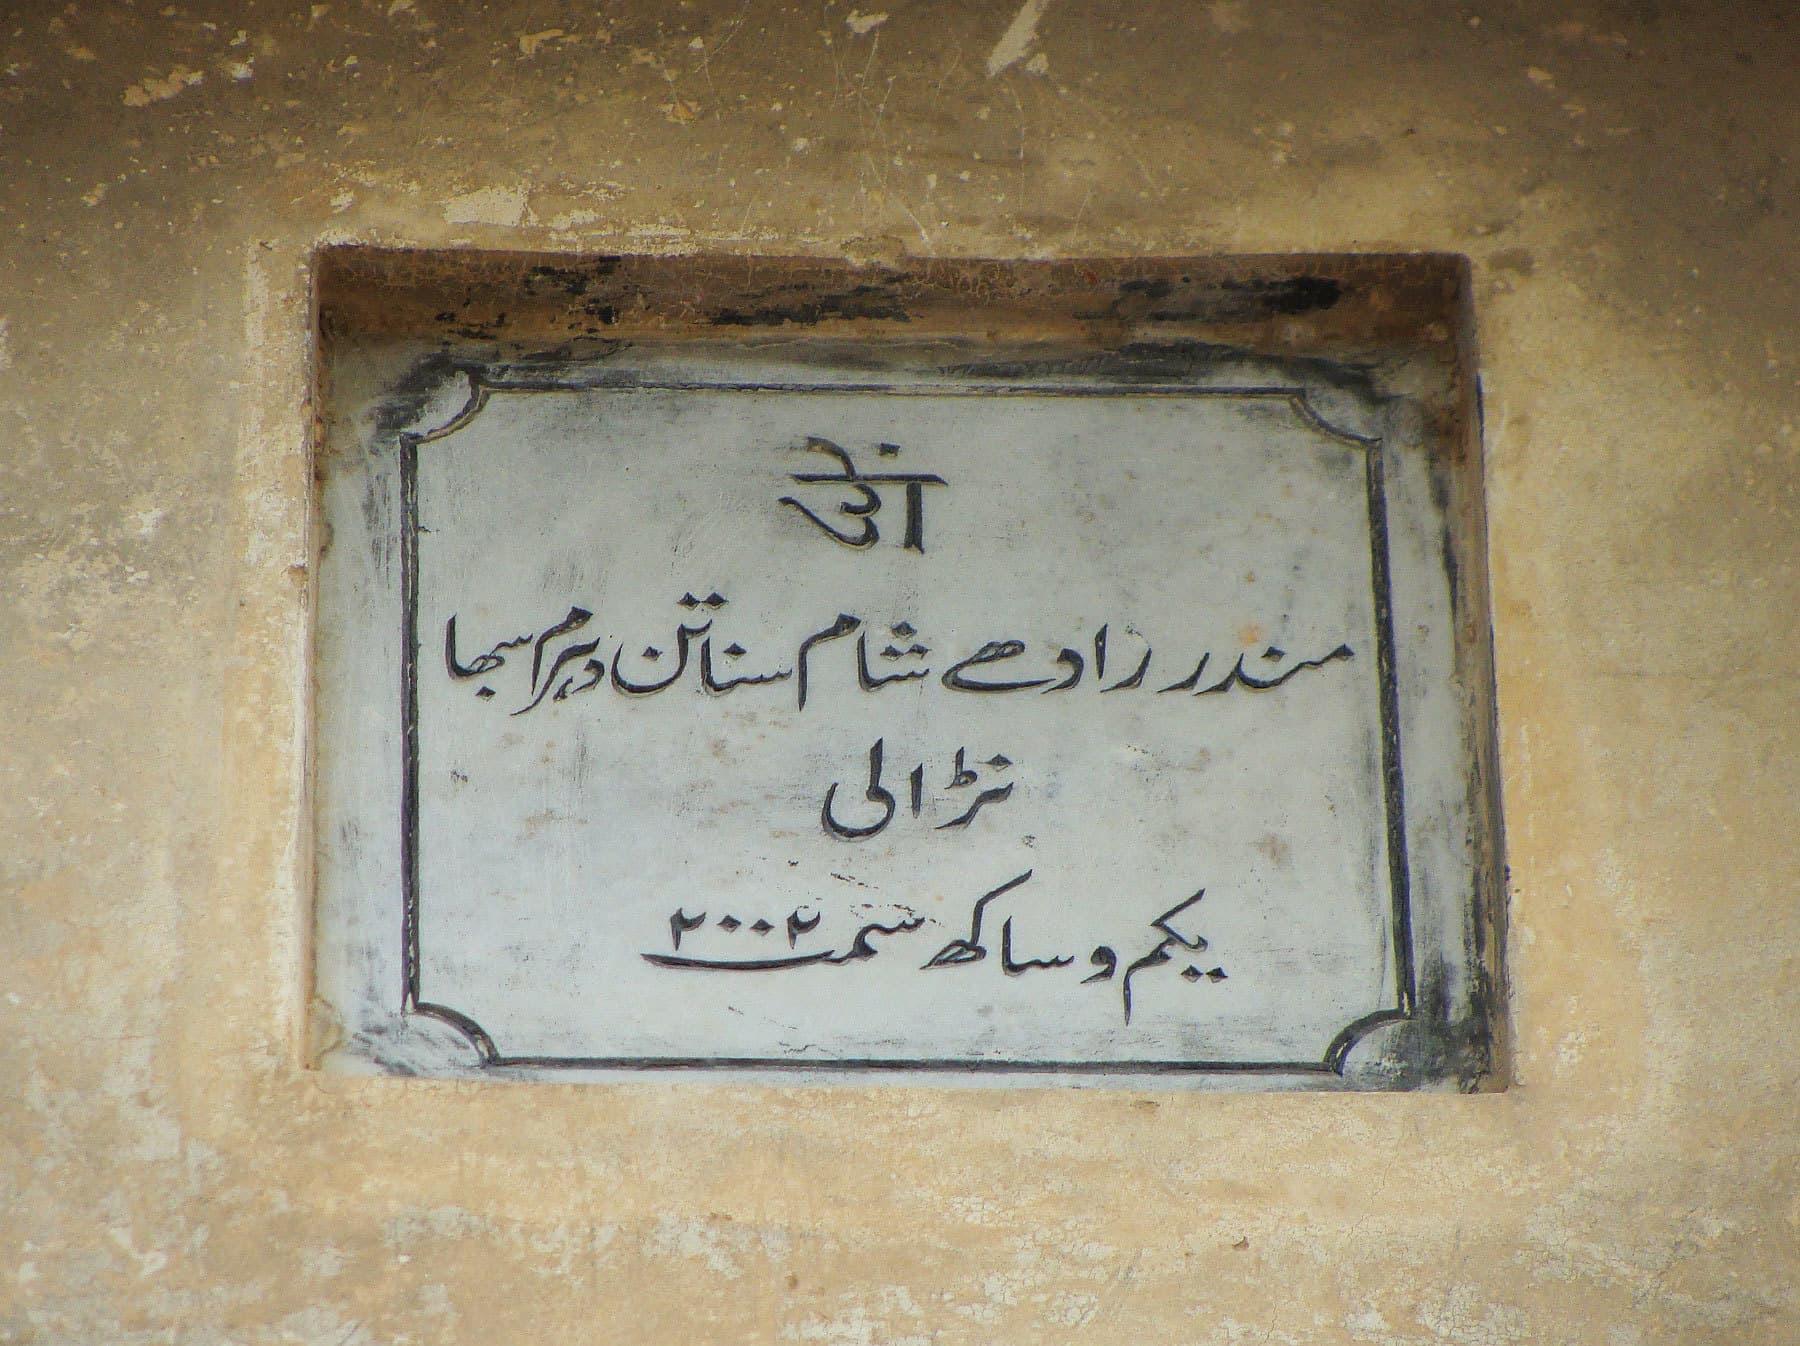 Inscription inside the temple.